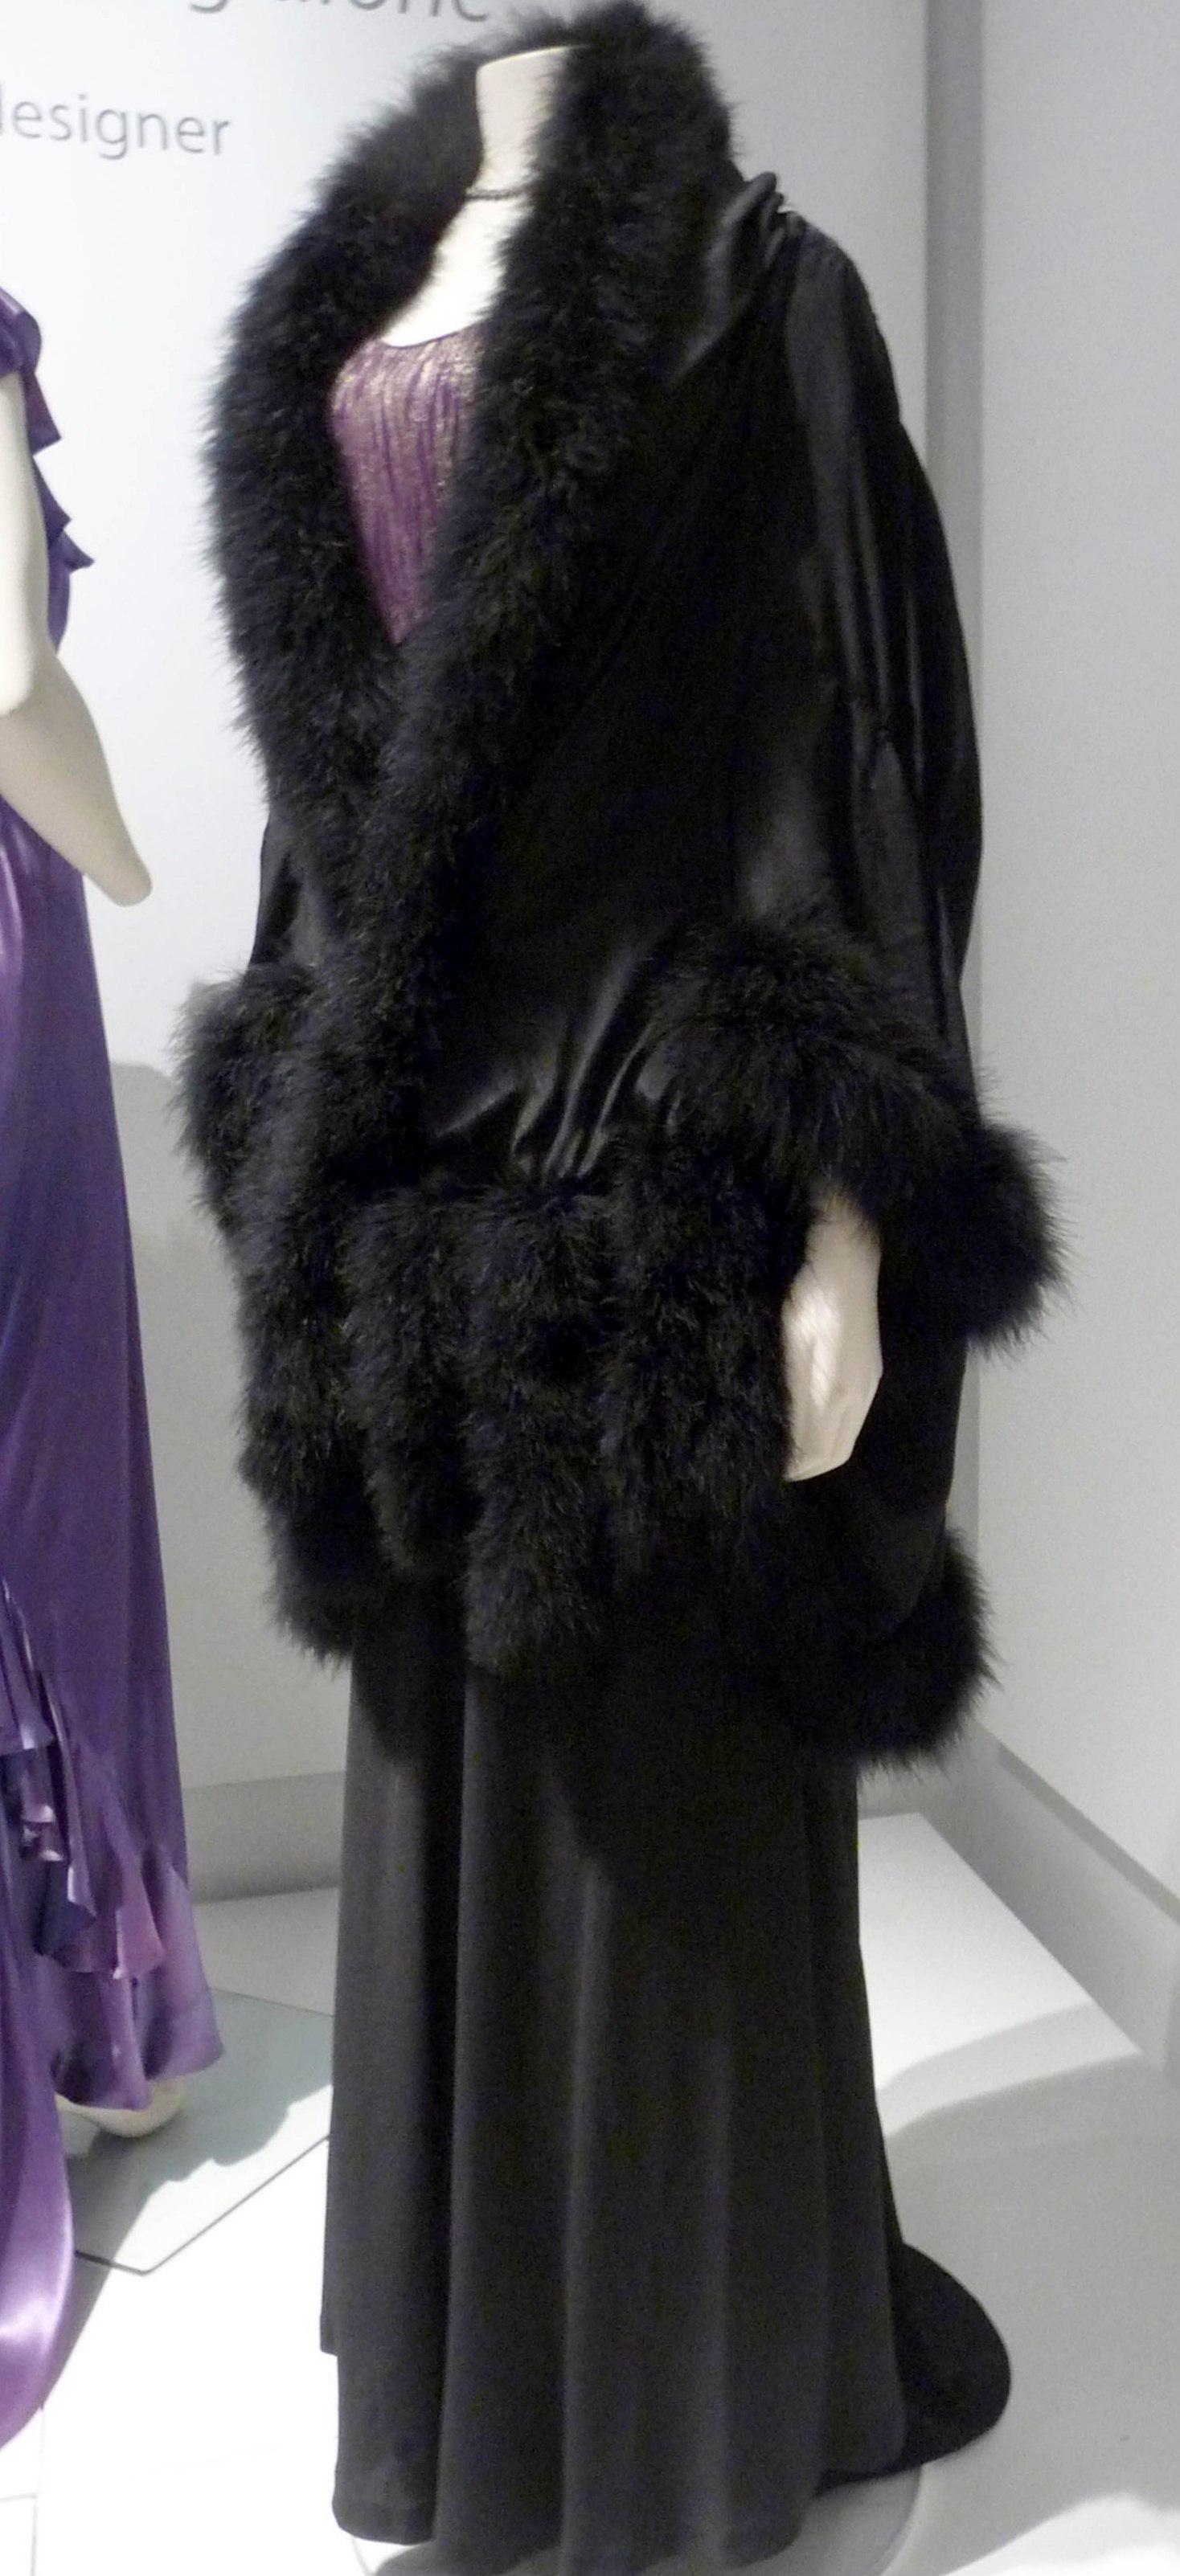 Evening dress, silk crepe & lurex, 1934-38. Evening mantle, silk crepe-de-chine & marabou feathers, 1930